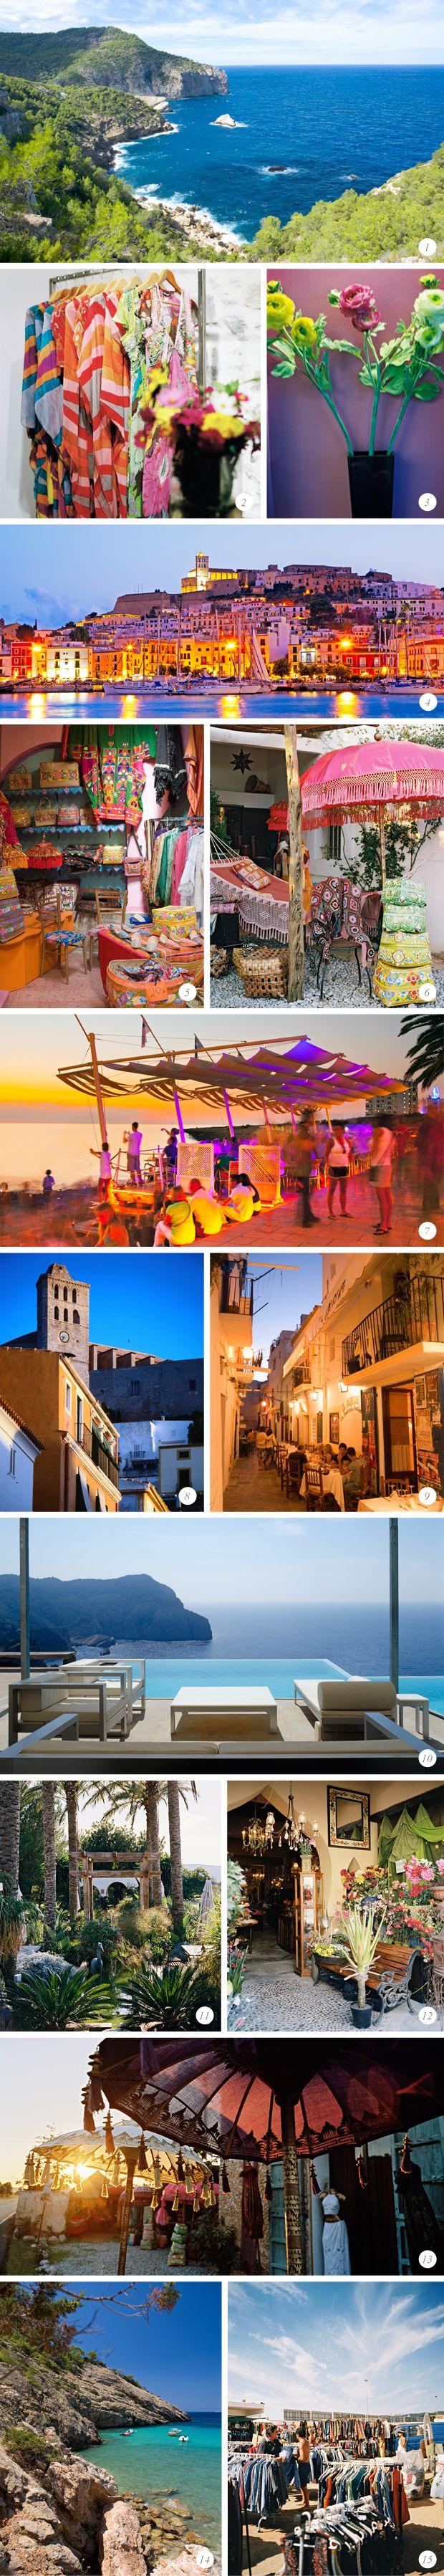 Ibiza, Spain https://www.facebook.com/SiModaFashionAgency?fref=ts